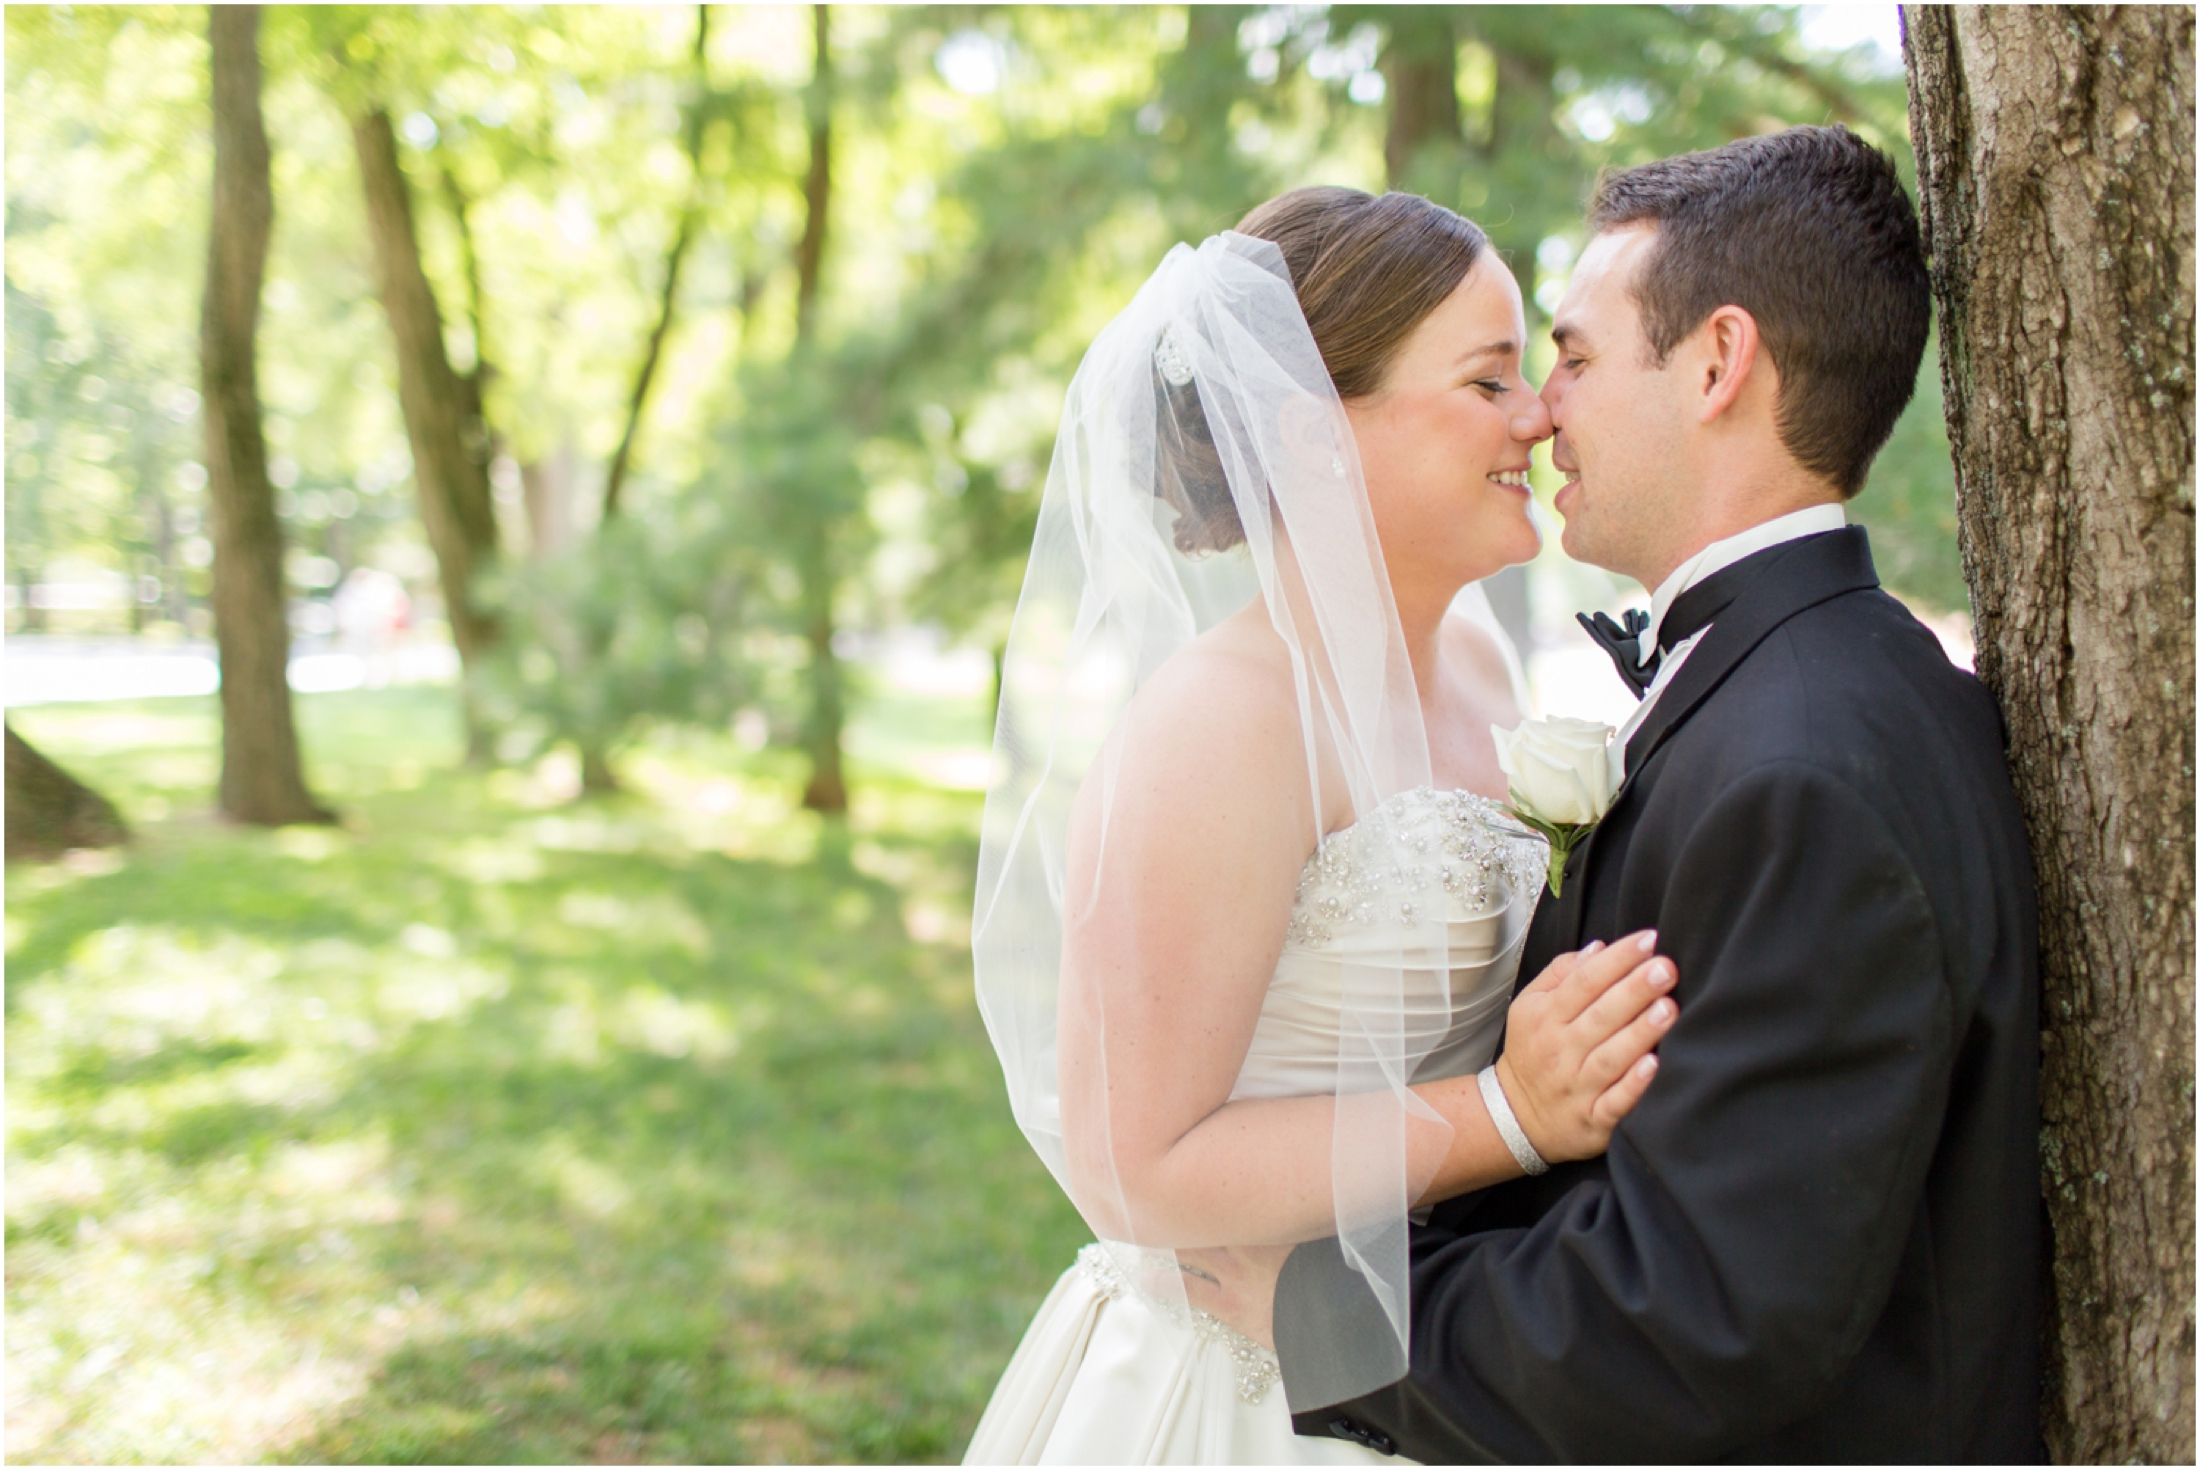 3-Bride-Groom-Portraits-Windsor-Wedding-433.jpg